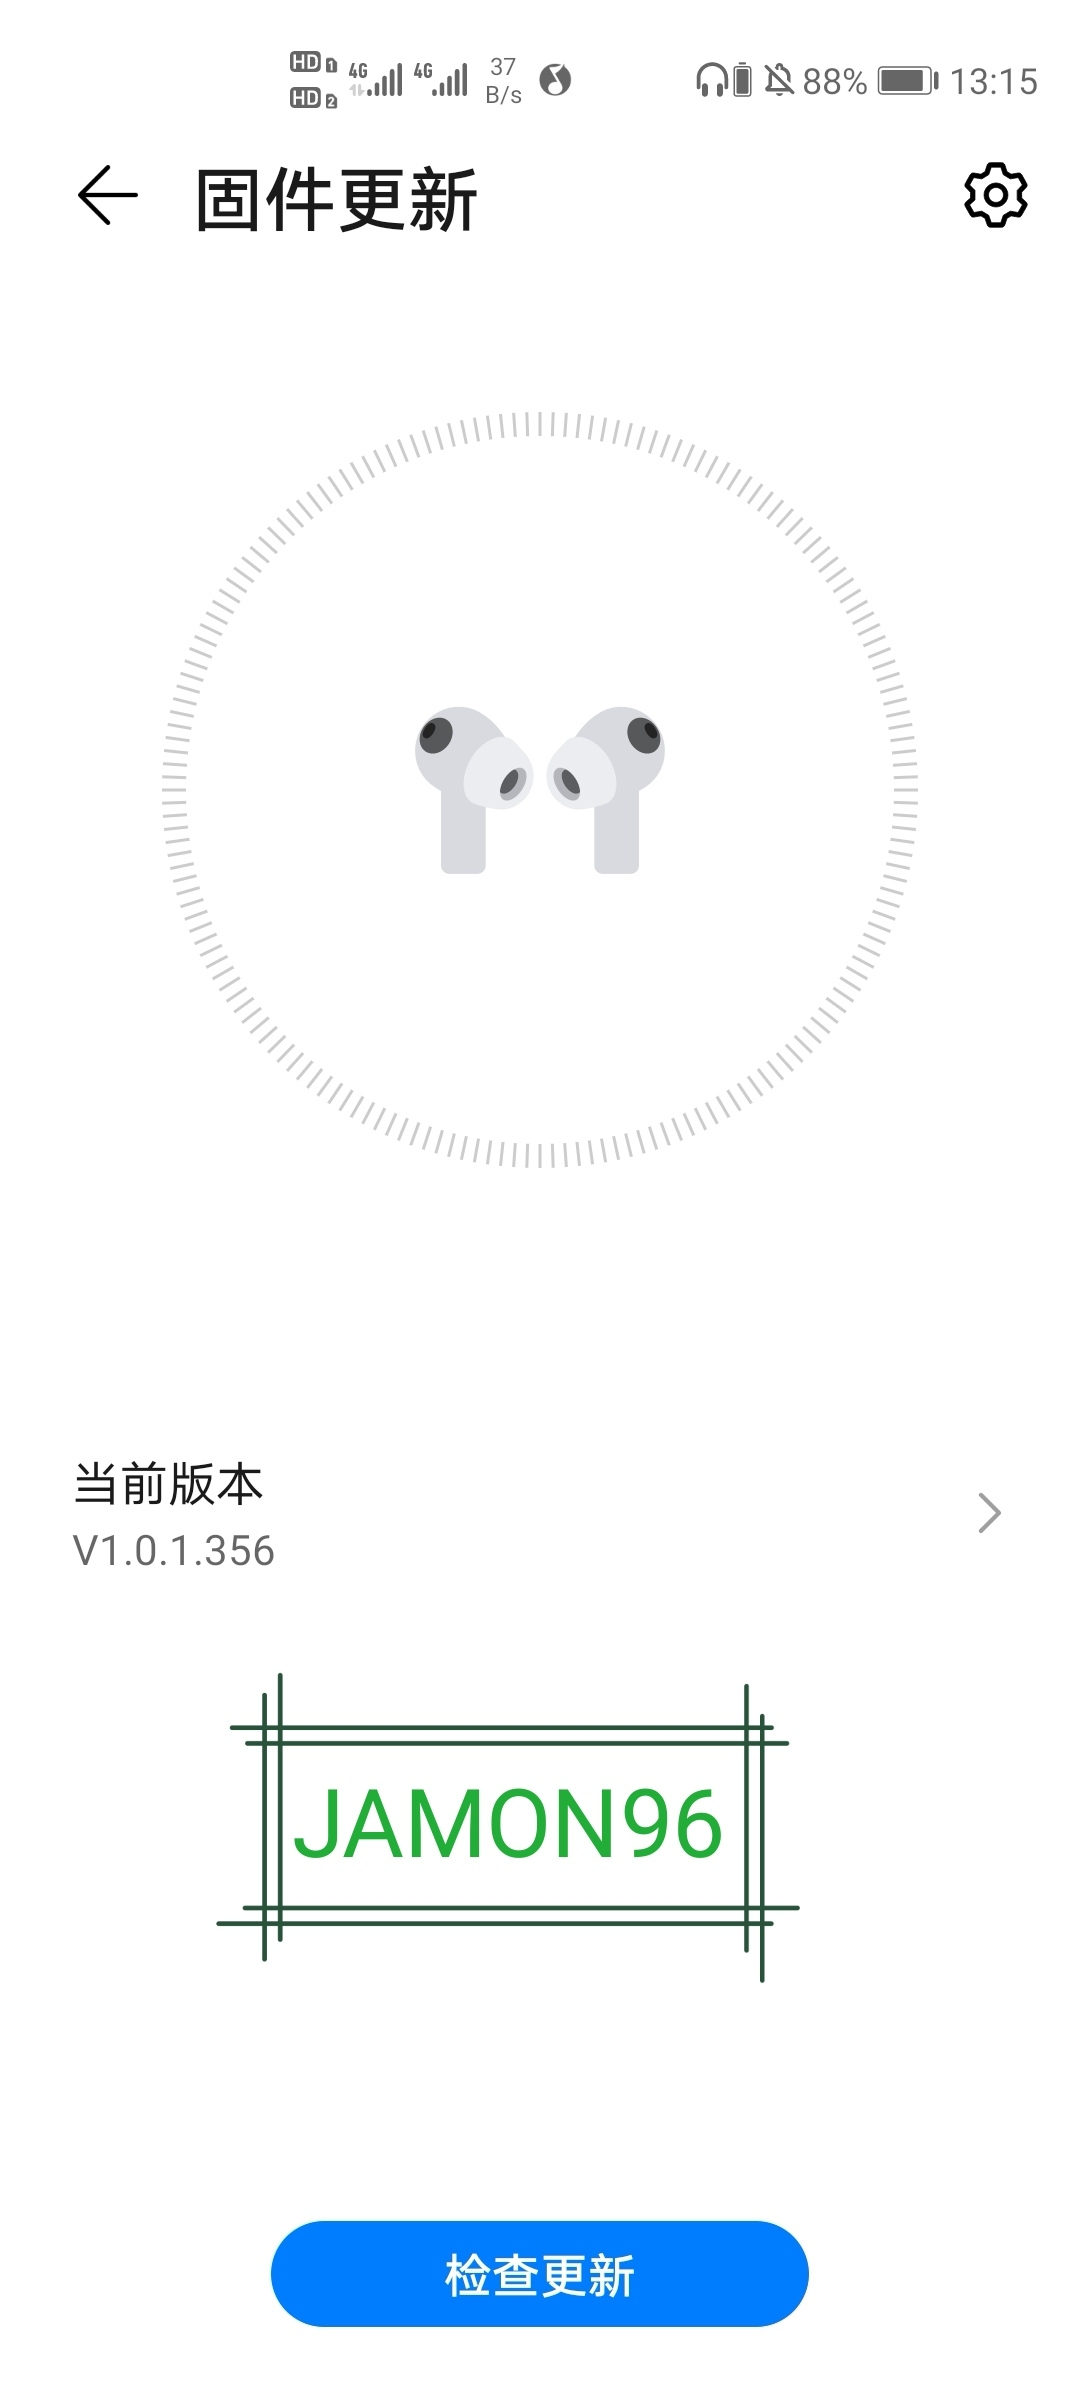 Screenshot_20210329_131546_com.huawei.smarthome_edit_38679382103992.jpg